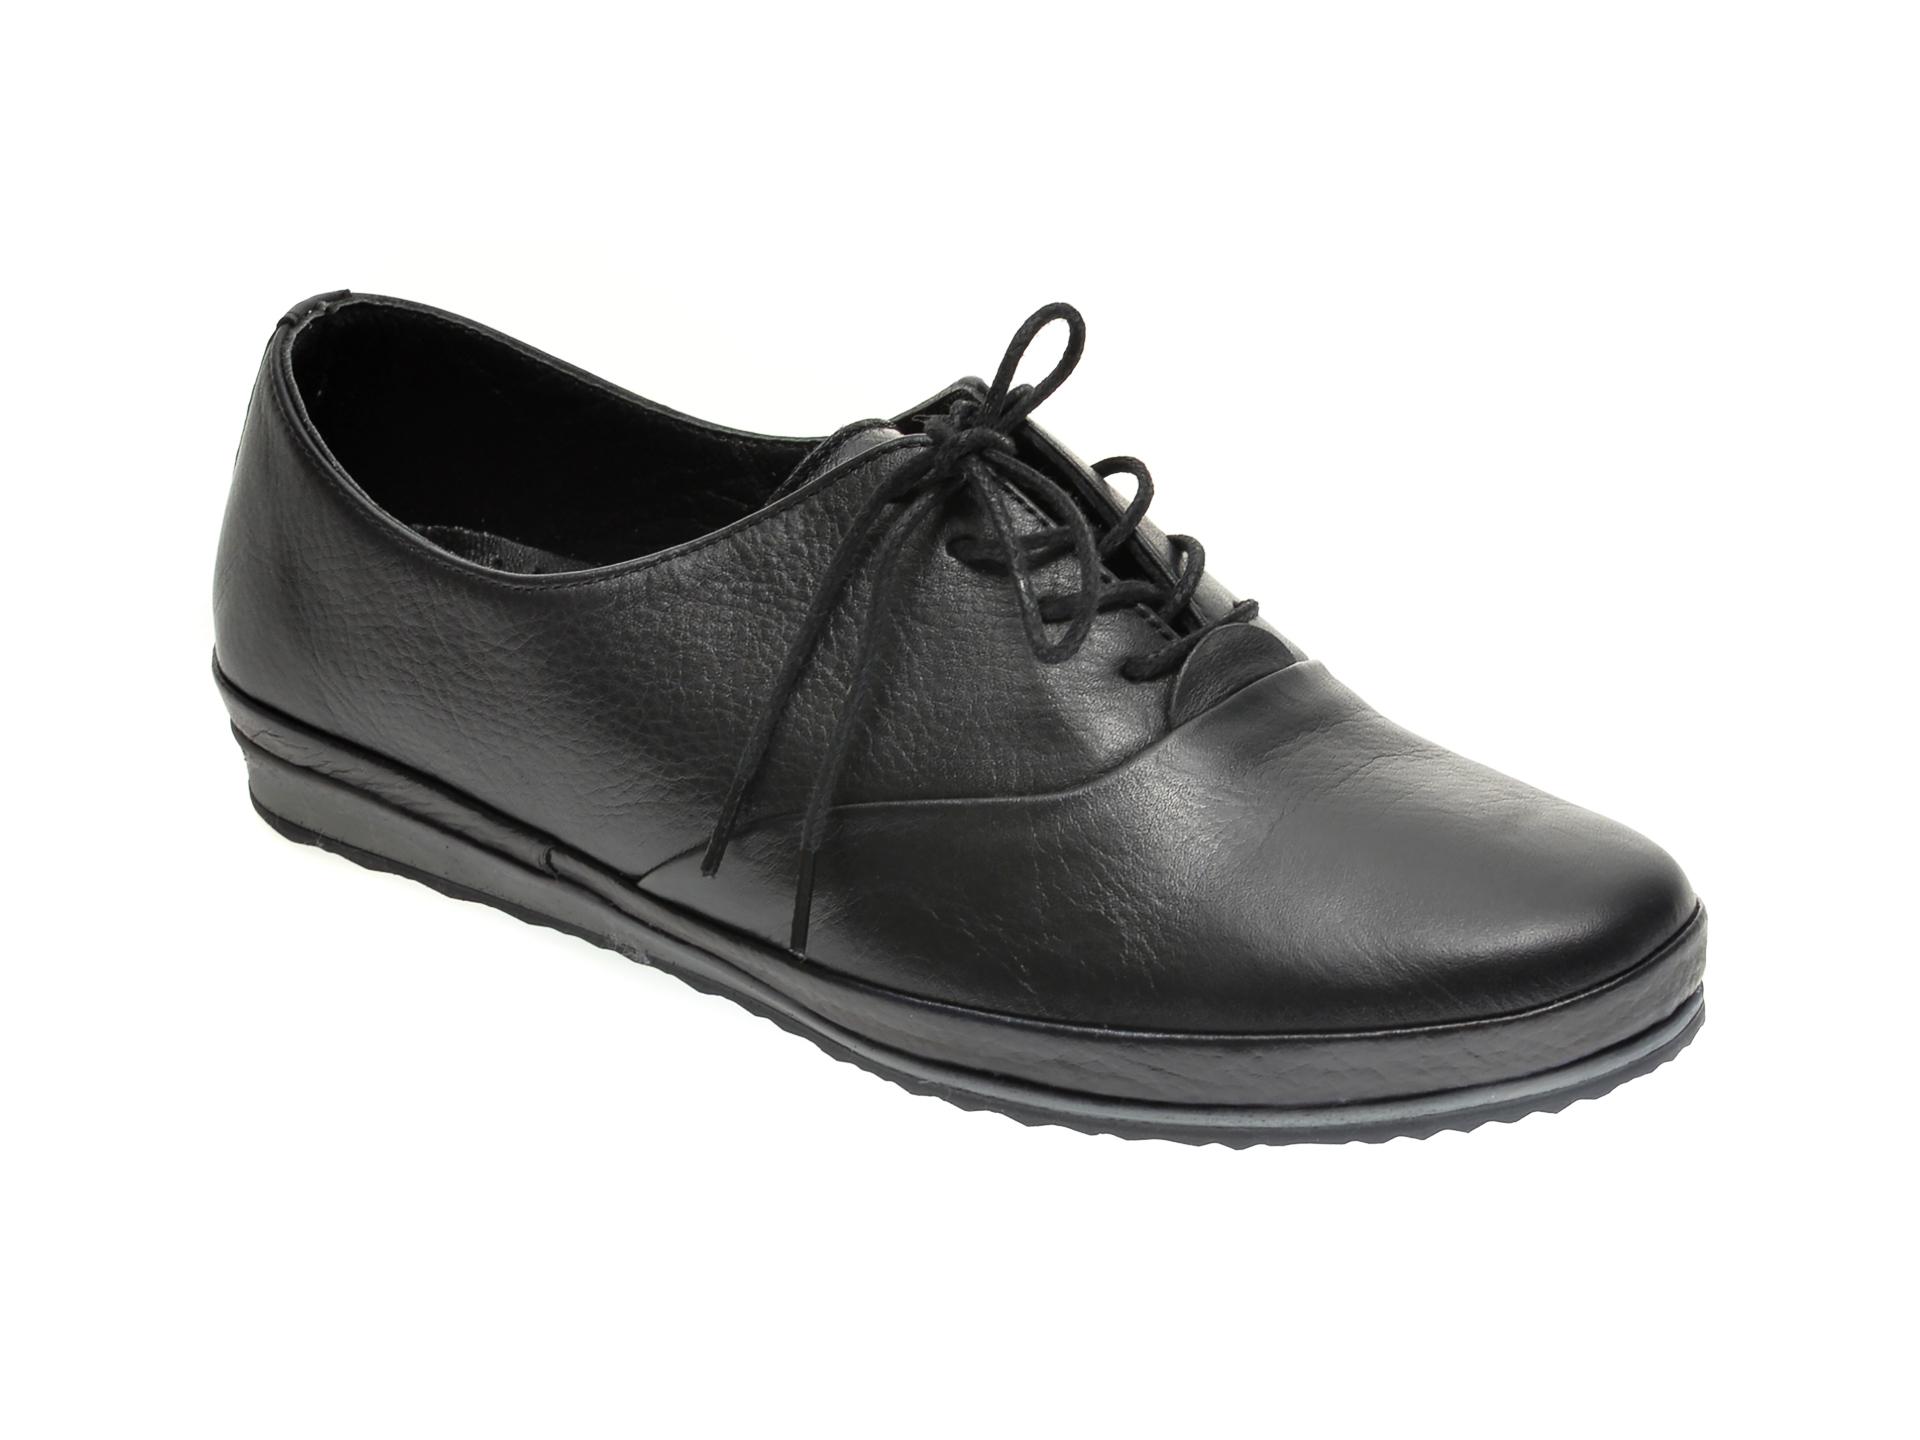 Pantofi ILOZ negri, 6005, din piele naturala imagine otter.ro